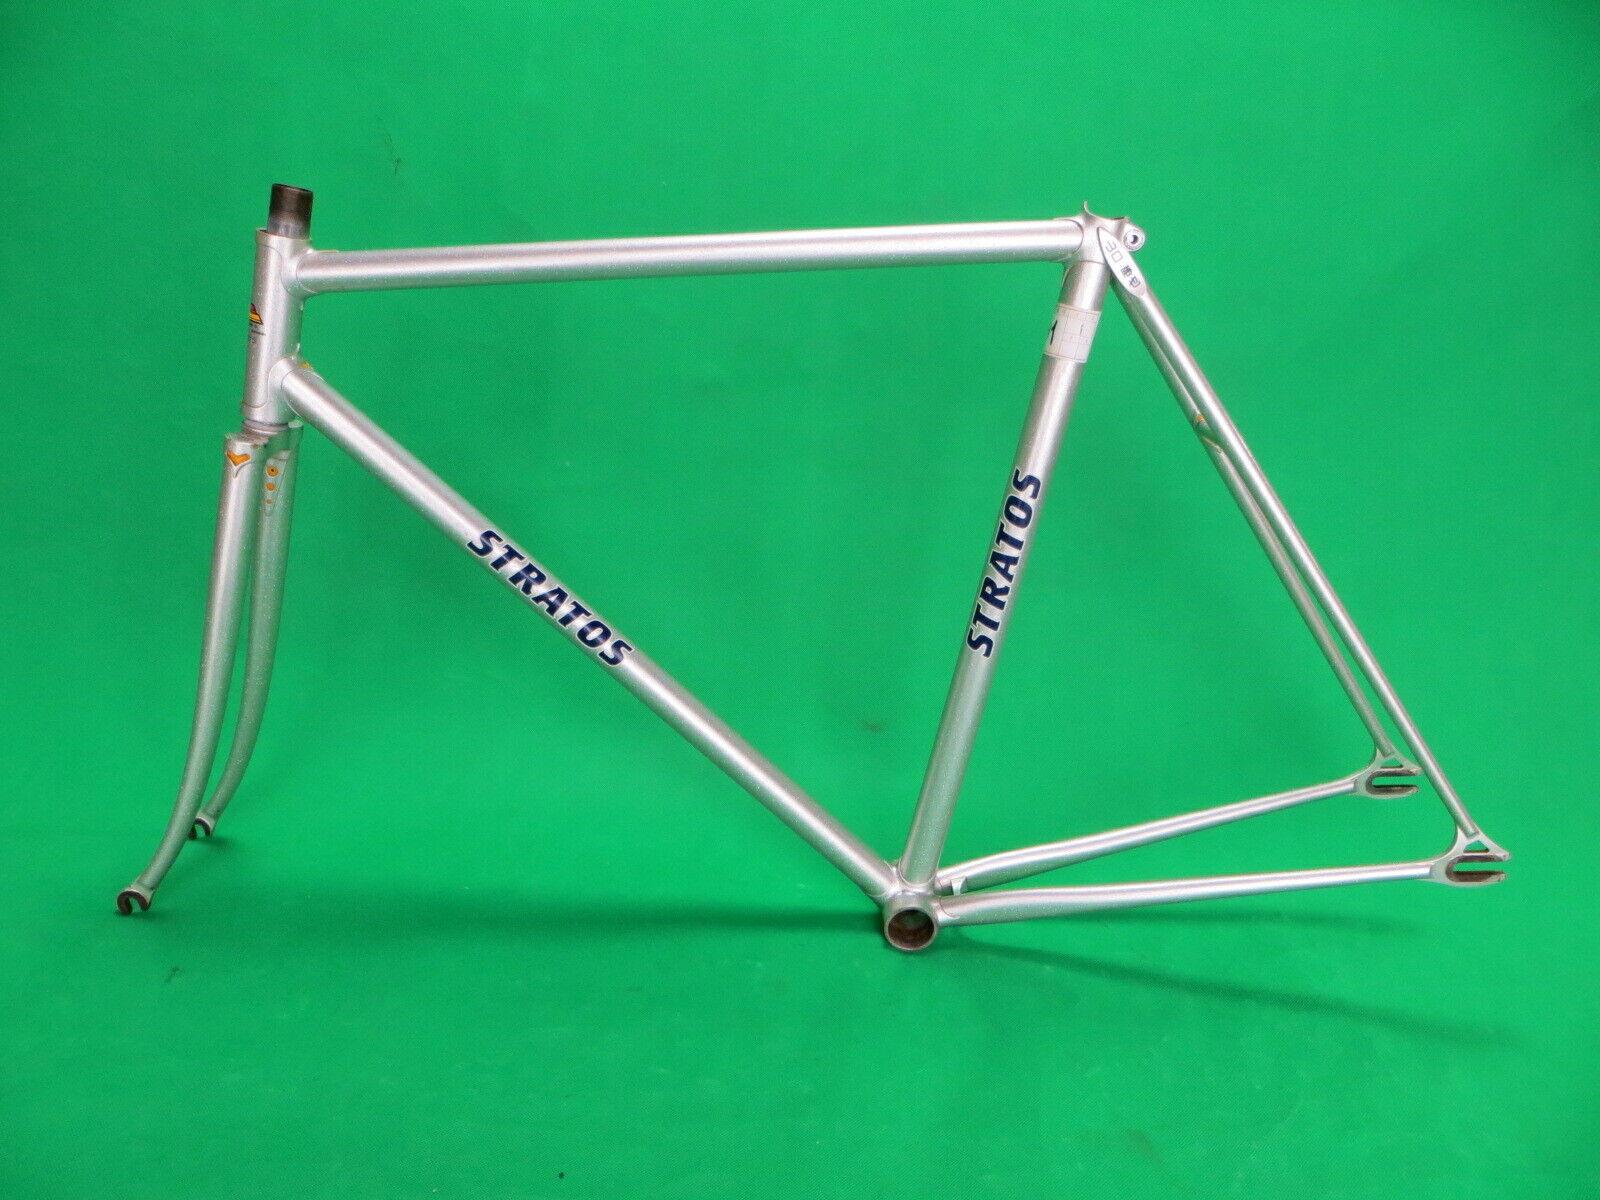 Pista De Marco Stratos Plata NJS Keirin bicicleta fija de engranaje 52.5cm